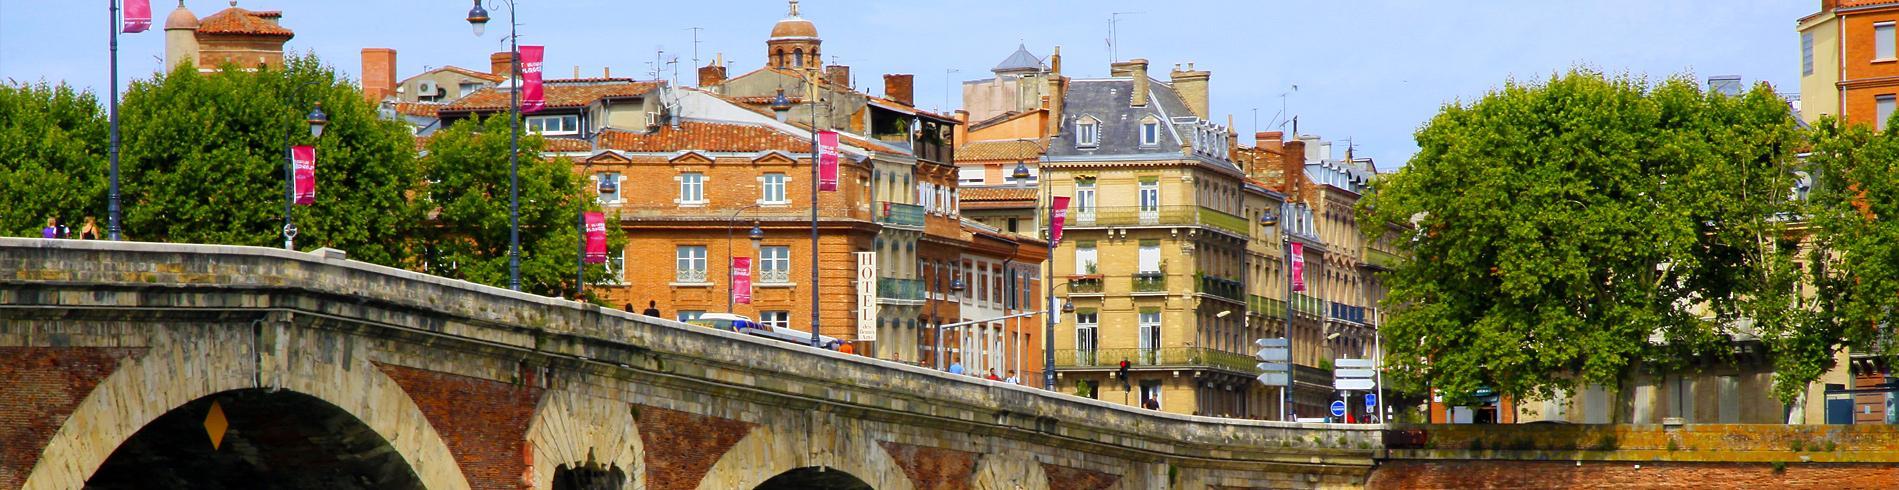 Toulouse bridge